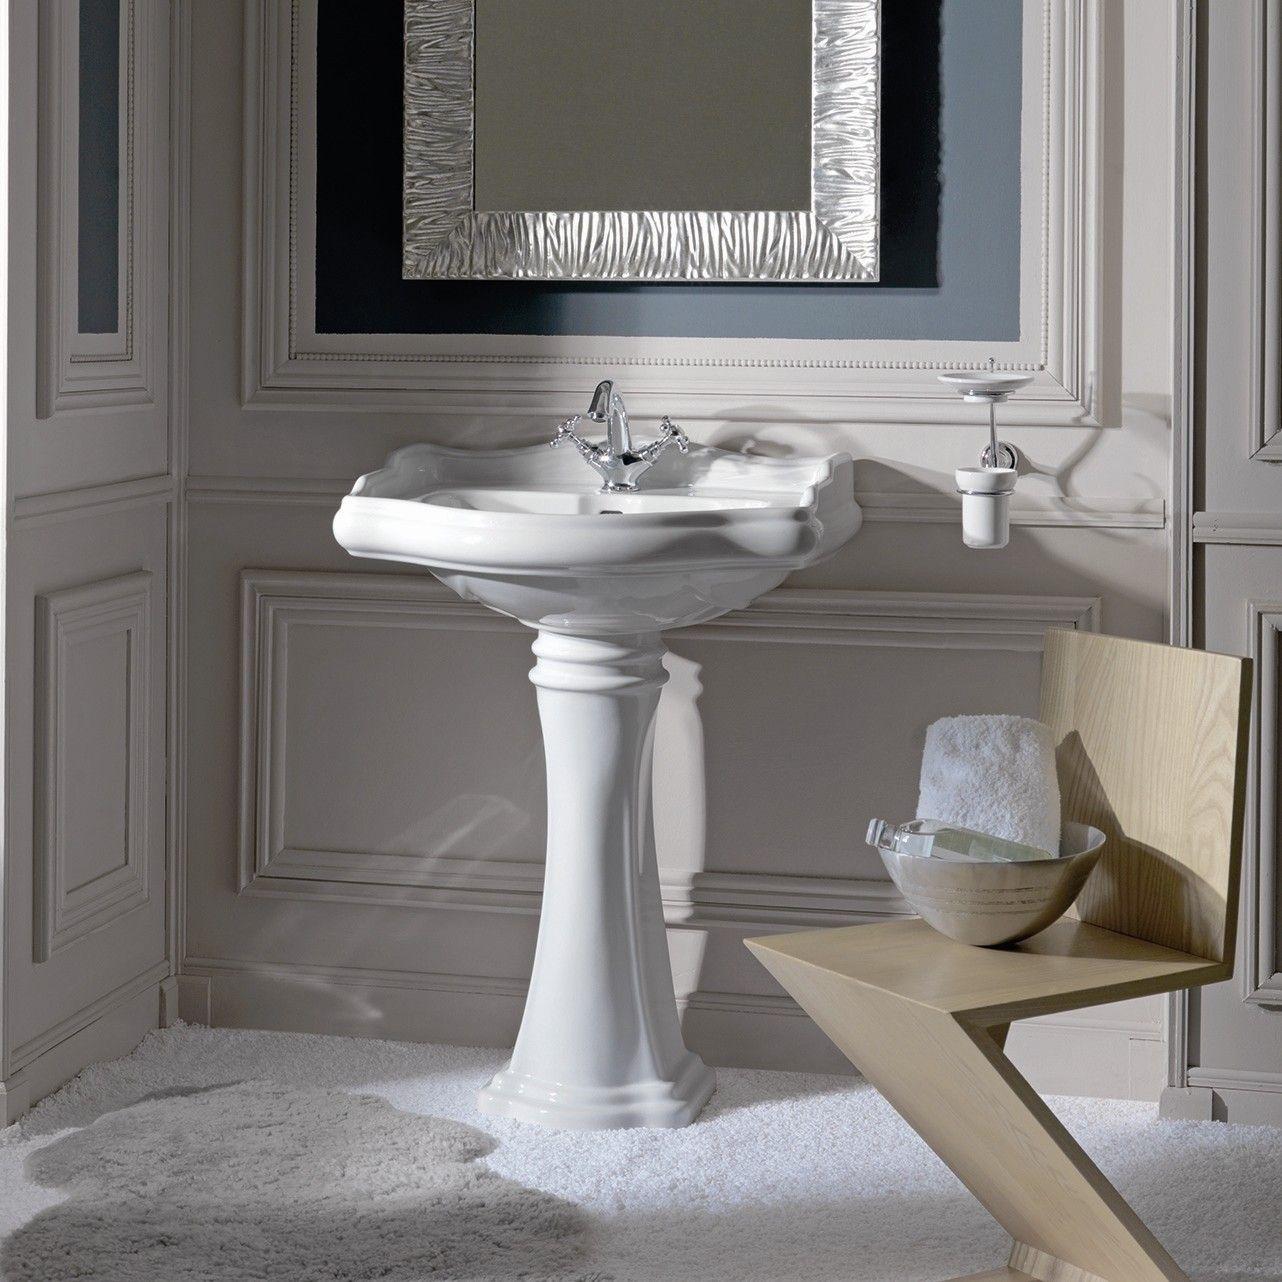 Retro Ceramic U Shaped Pedestal Bathroom Sink With Overflow Pedestal Sink Ws Bath Collections Sink